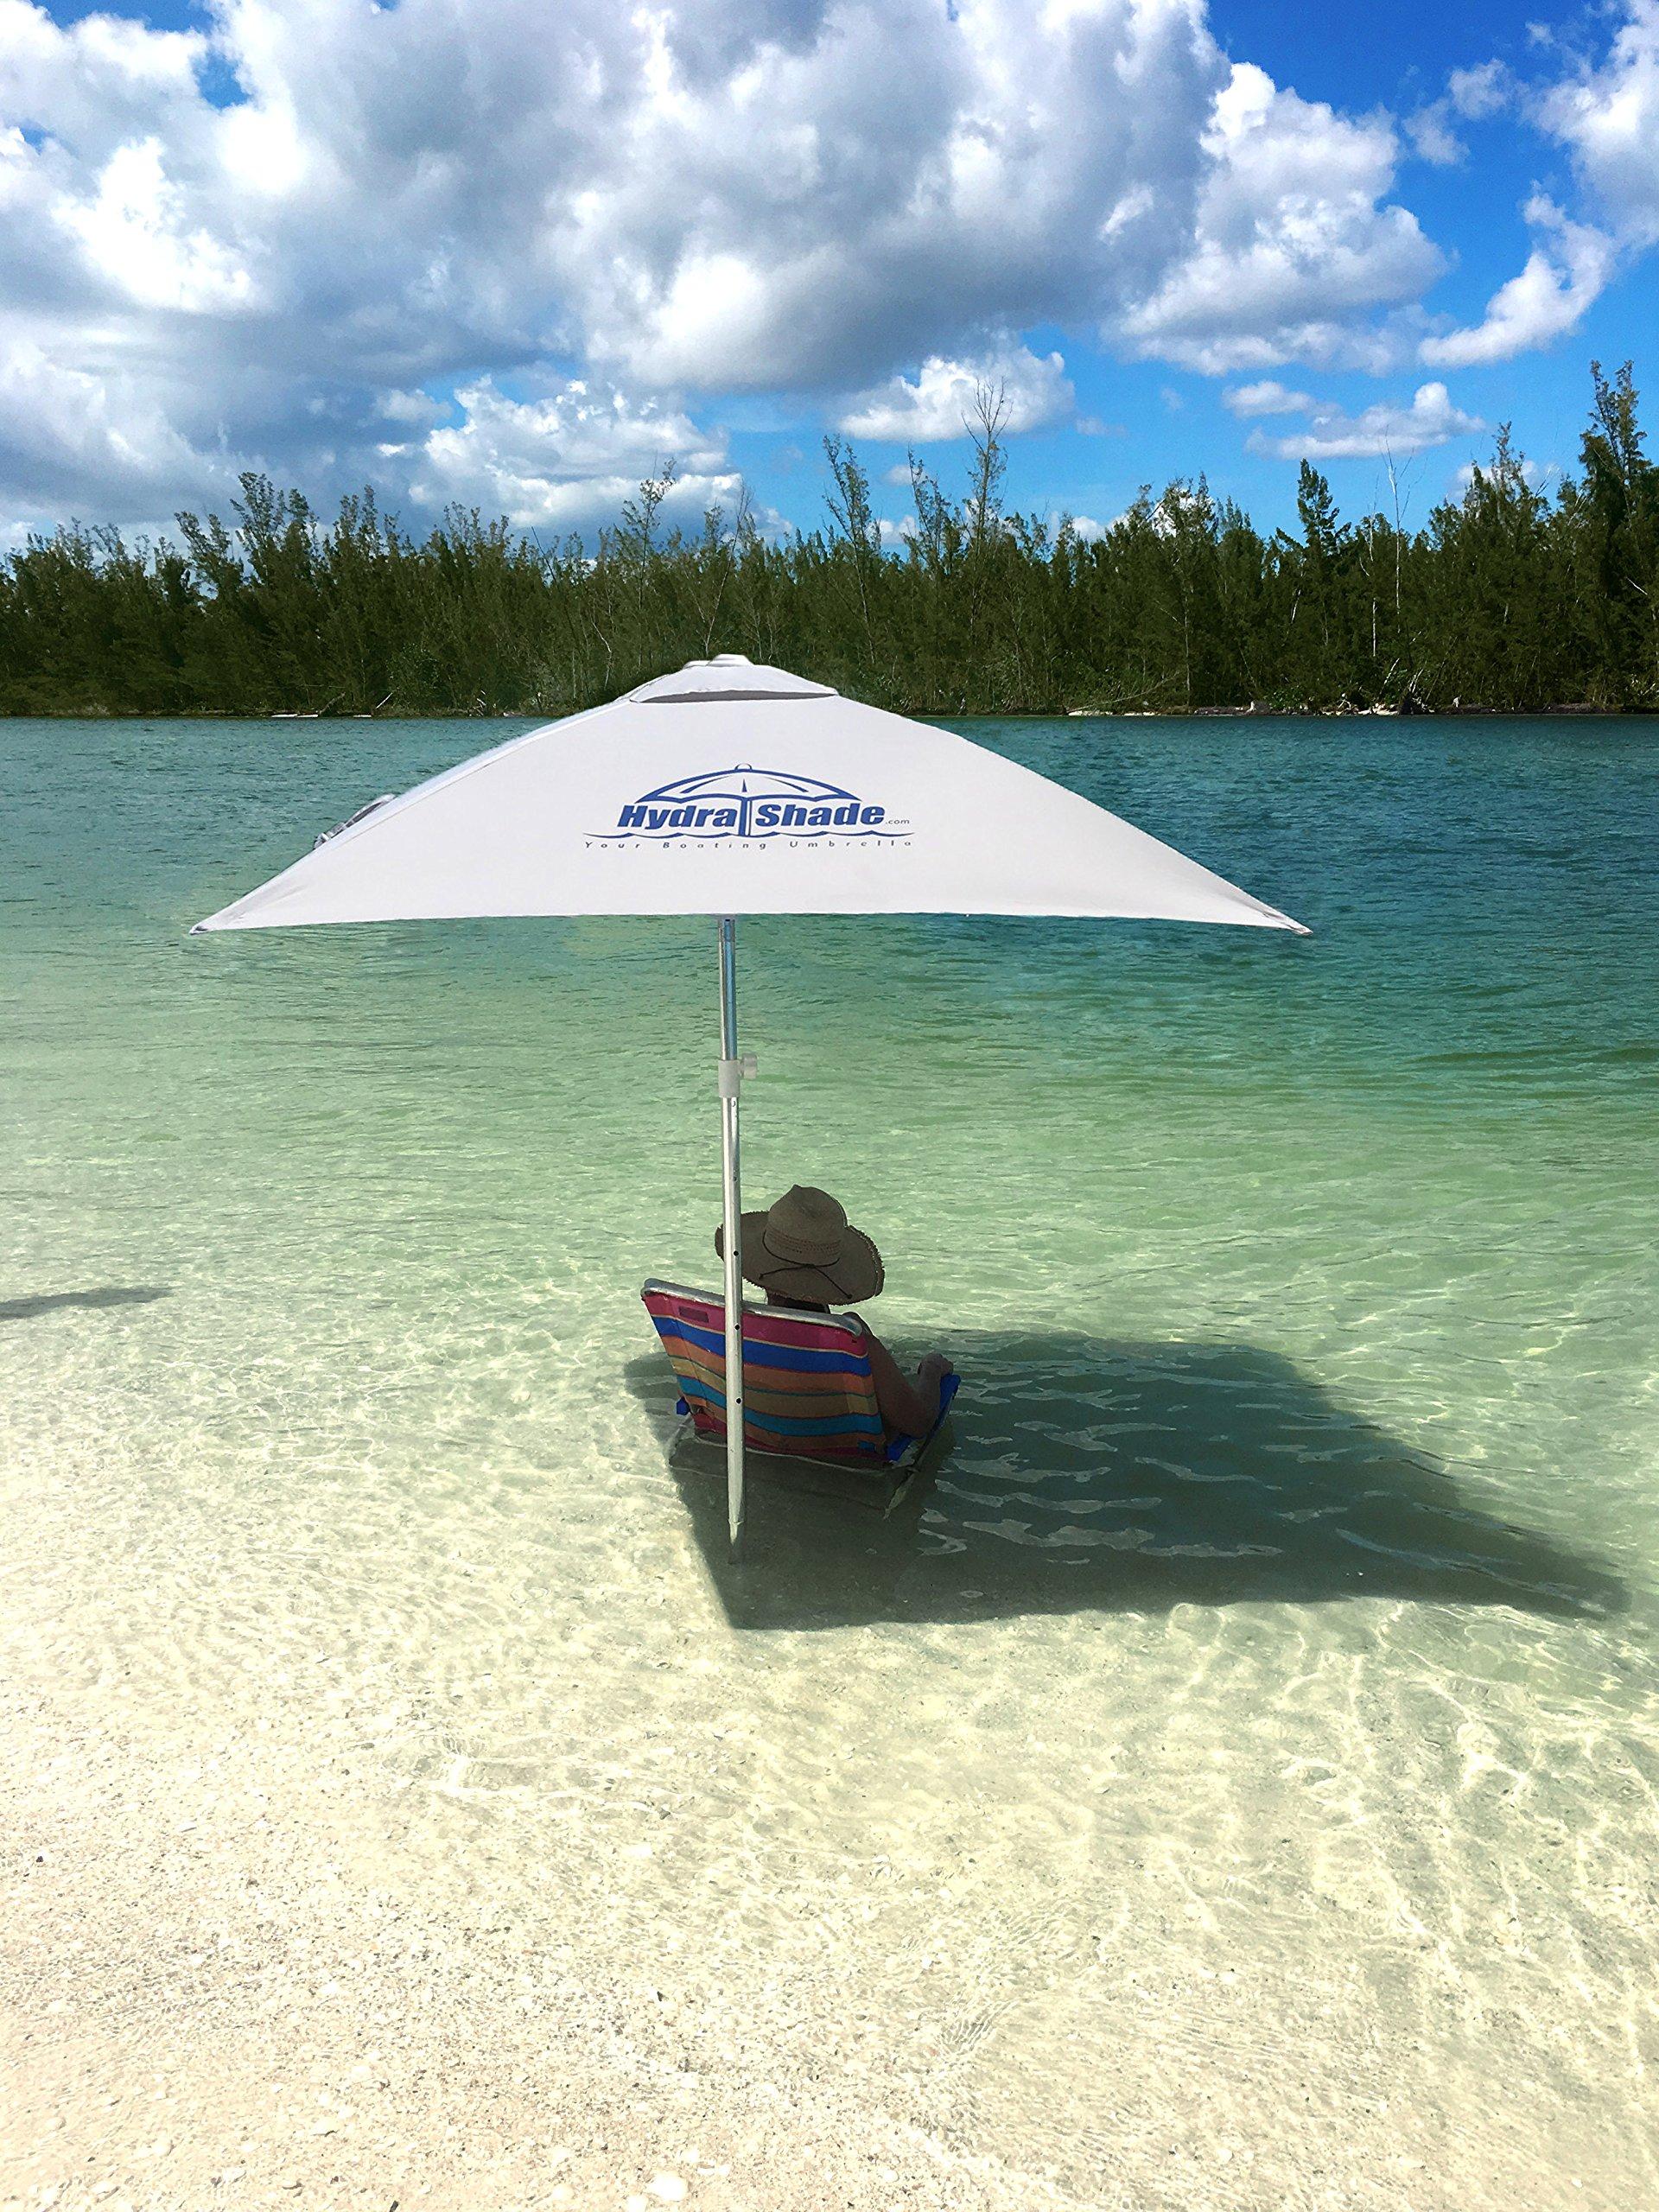 Hospitality Rattan XL-150 Hydra Shade 8' Square Boating & Beach Umbrella Kit, White by Hospitality Rattan (Image #5)